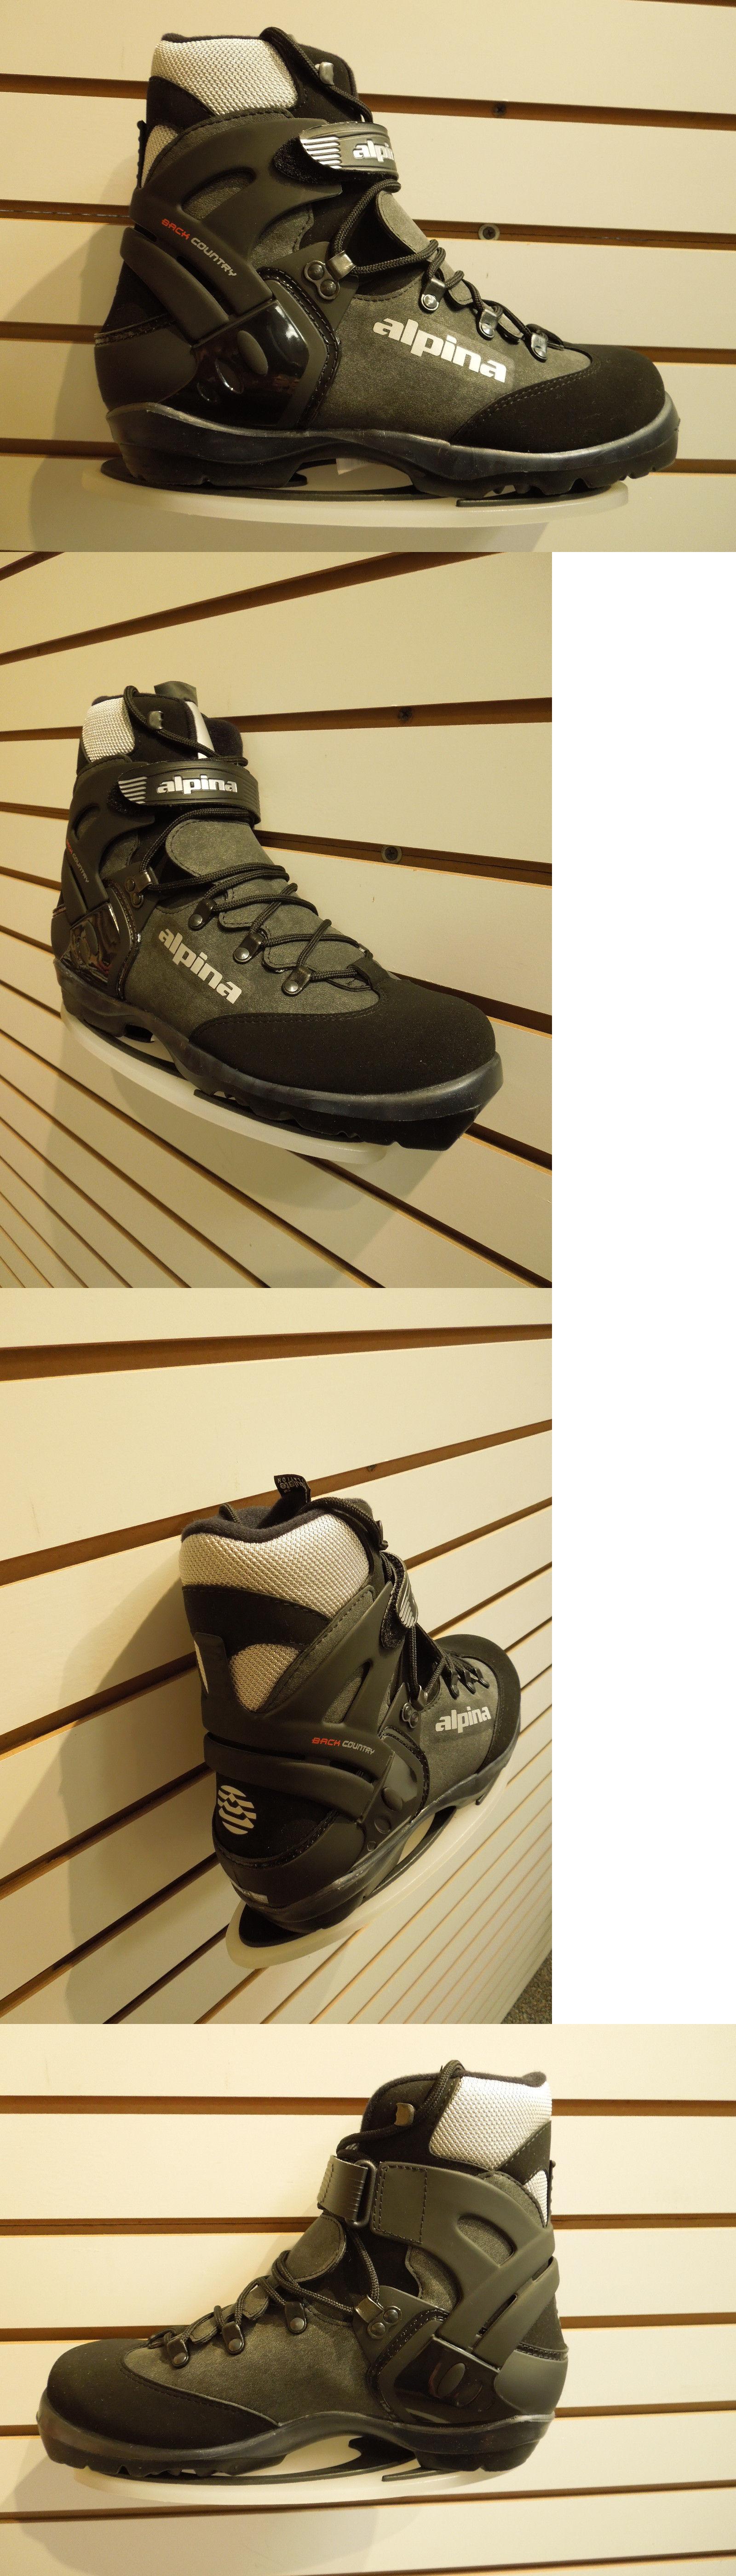 Boots Alpina Bc Cross Country Ski Boot Nnn Bc Size - Alpina bc boots